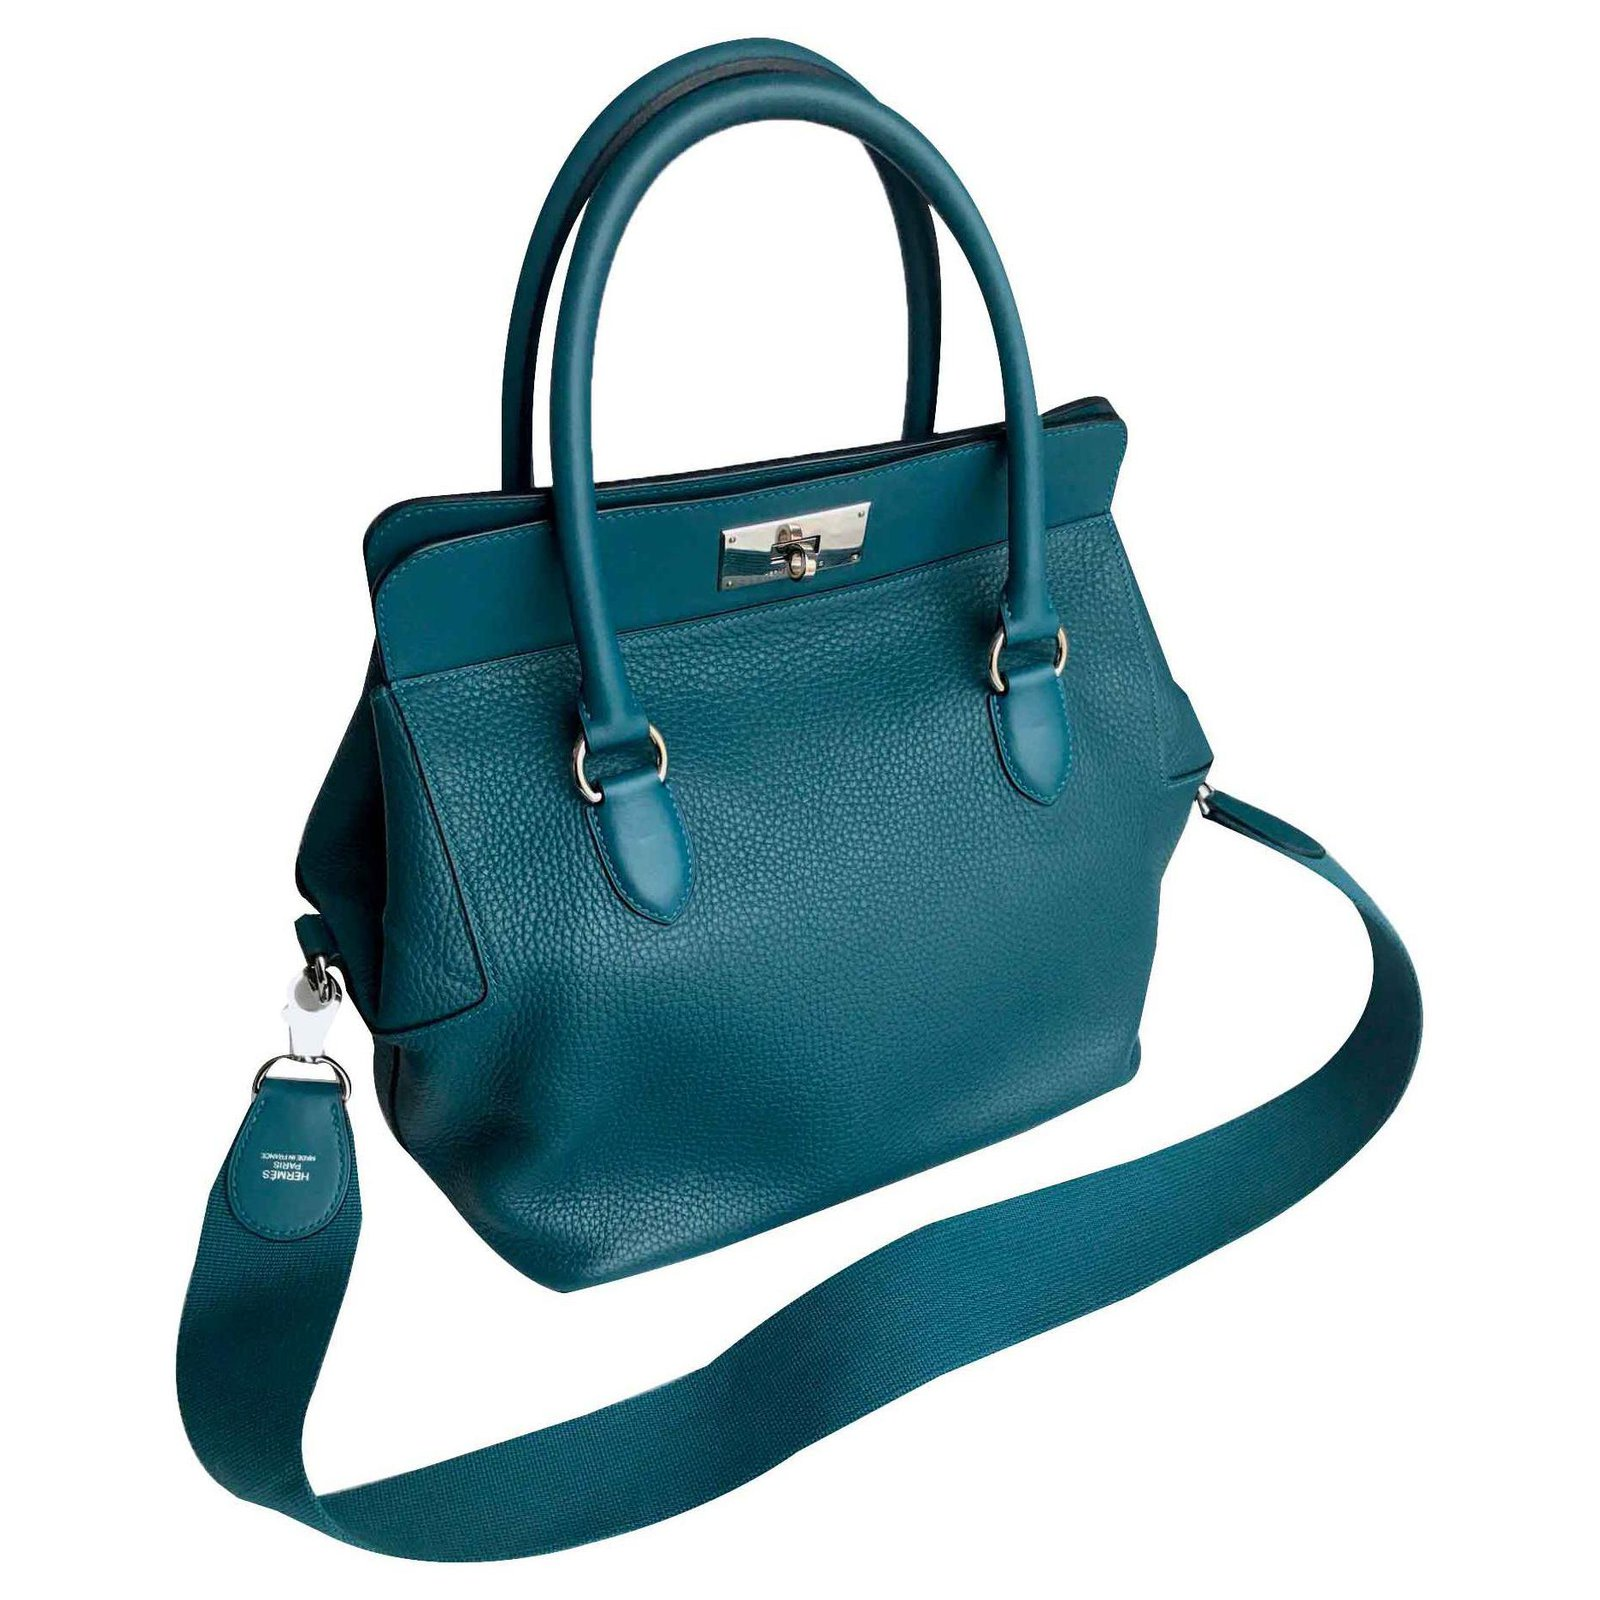 Clemence Leather Handbags